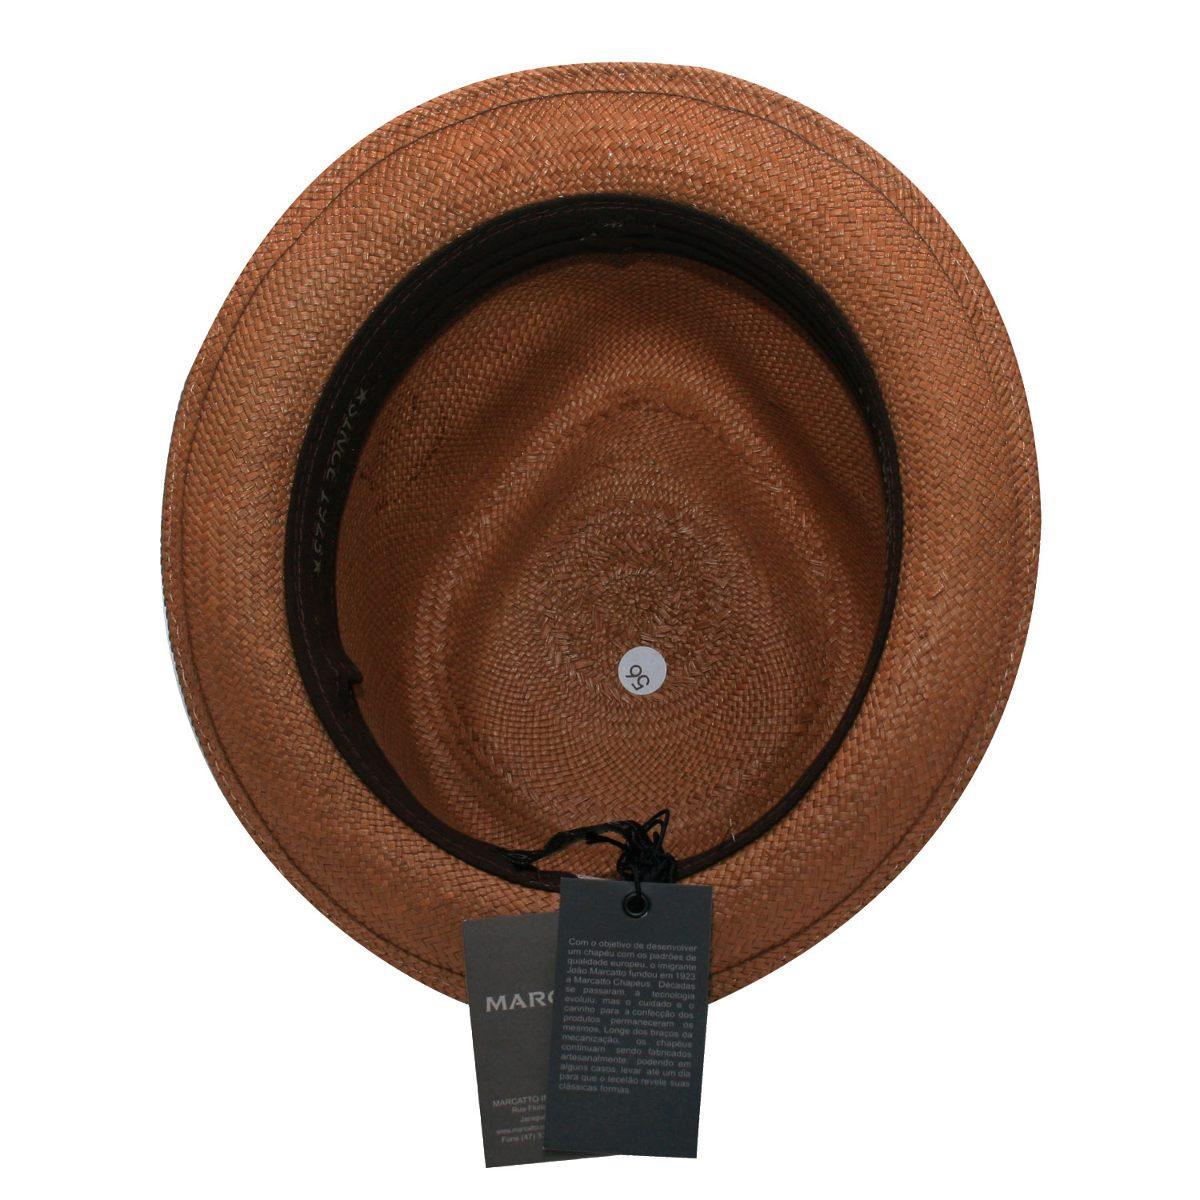 26c5d4c8b3d01 chapéu panamá marcatto-marrom-tamanho 56. Carregando zoom.